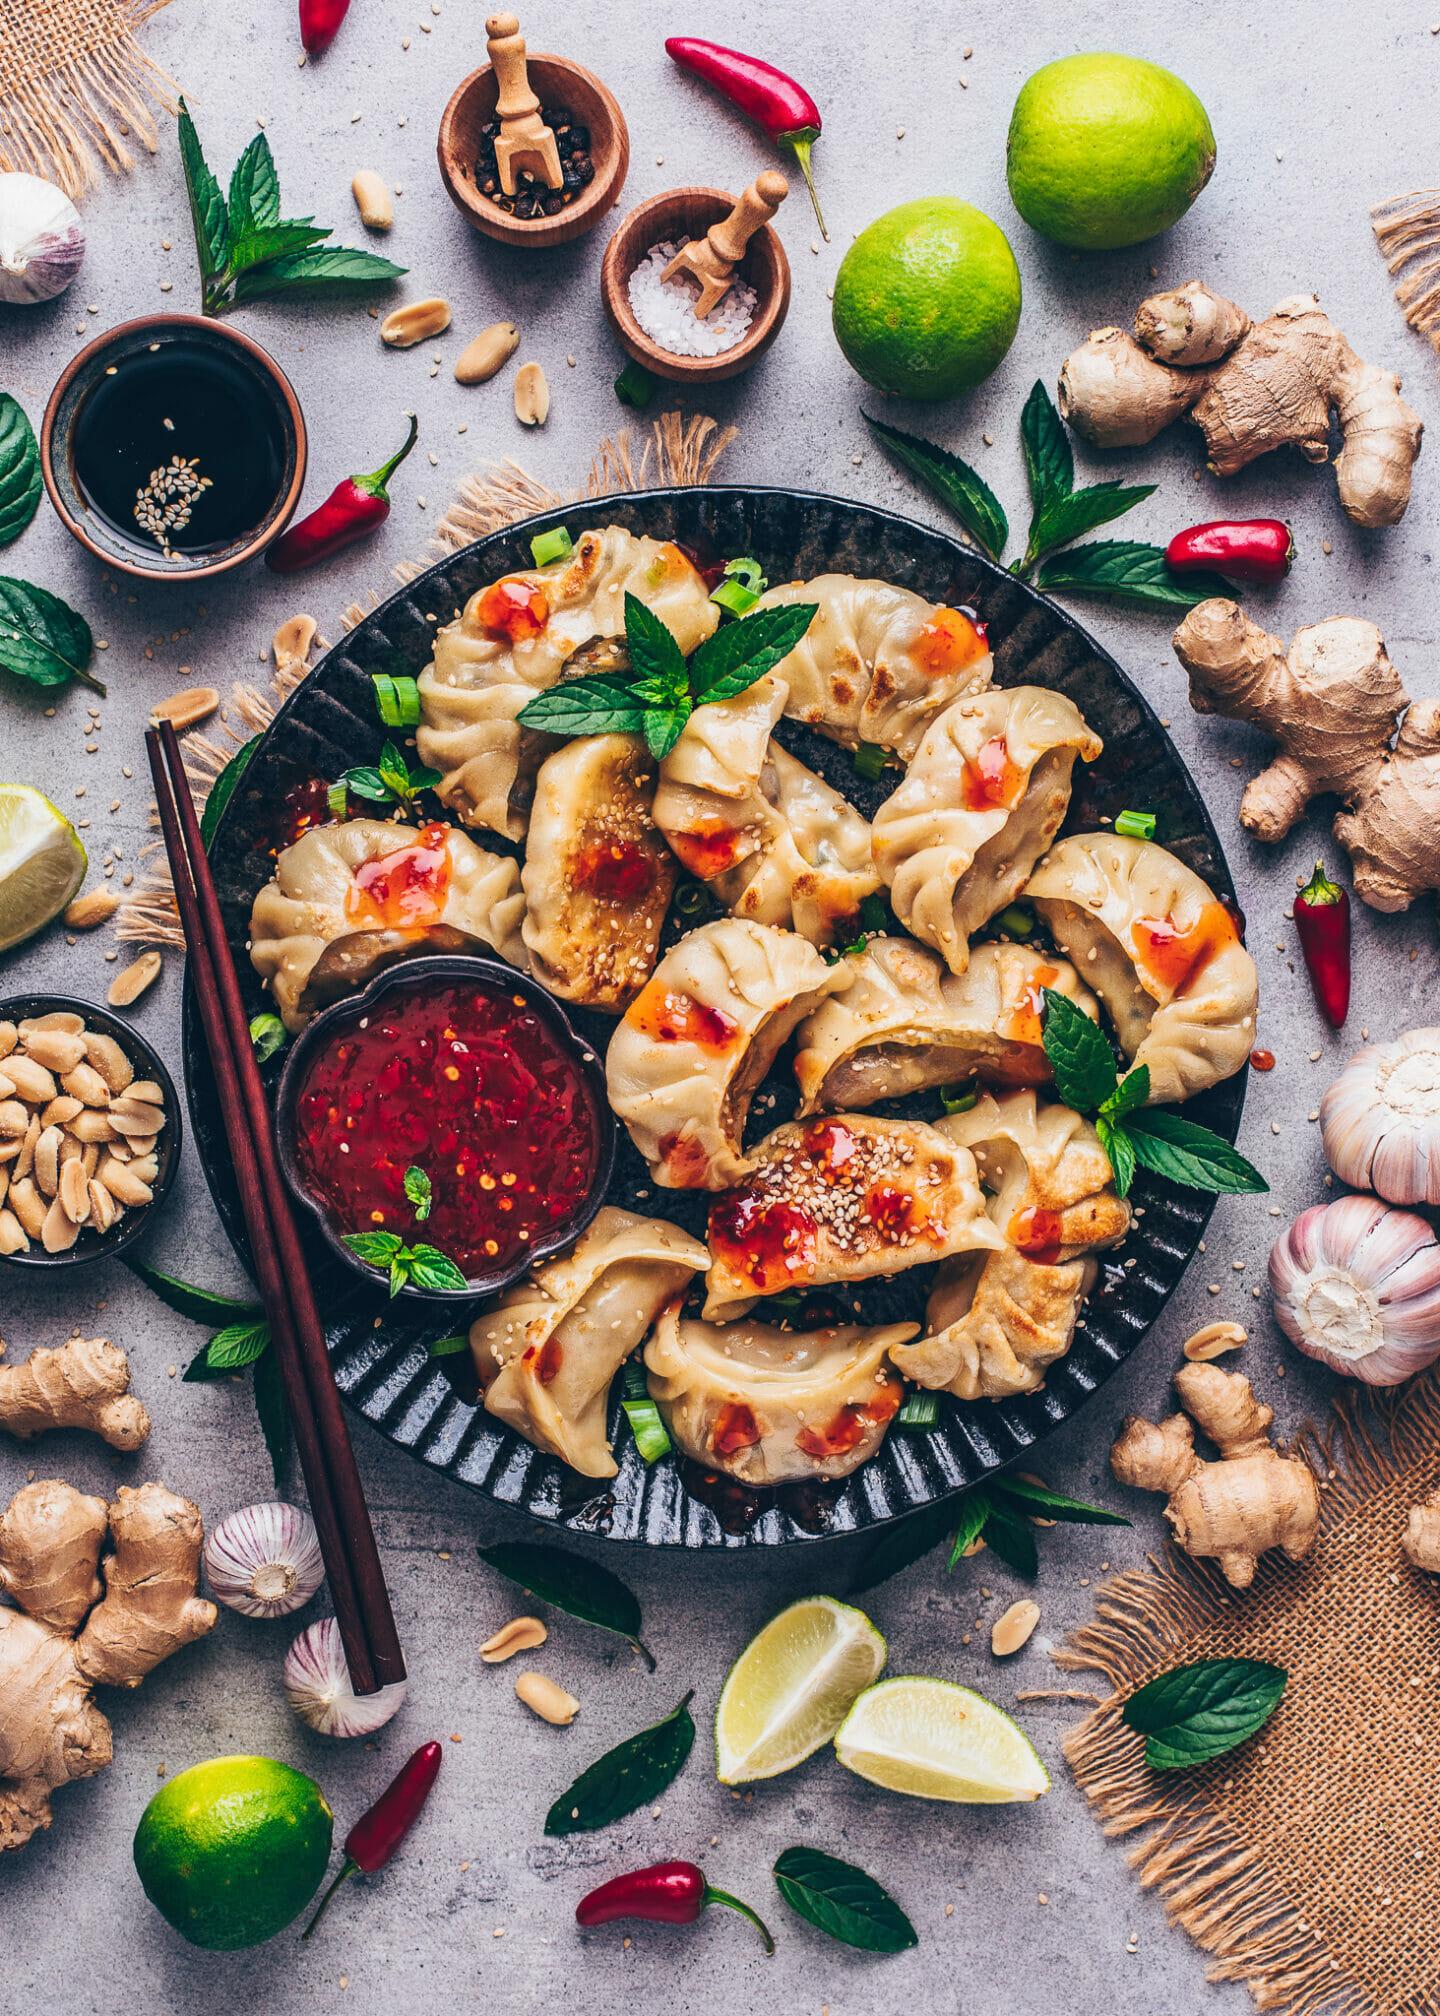 Gyoza Dumplings with Sweet Chili Sauce